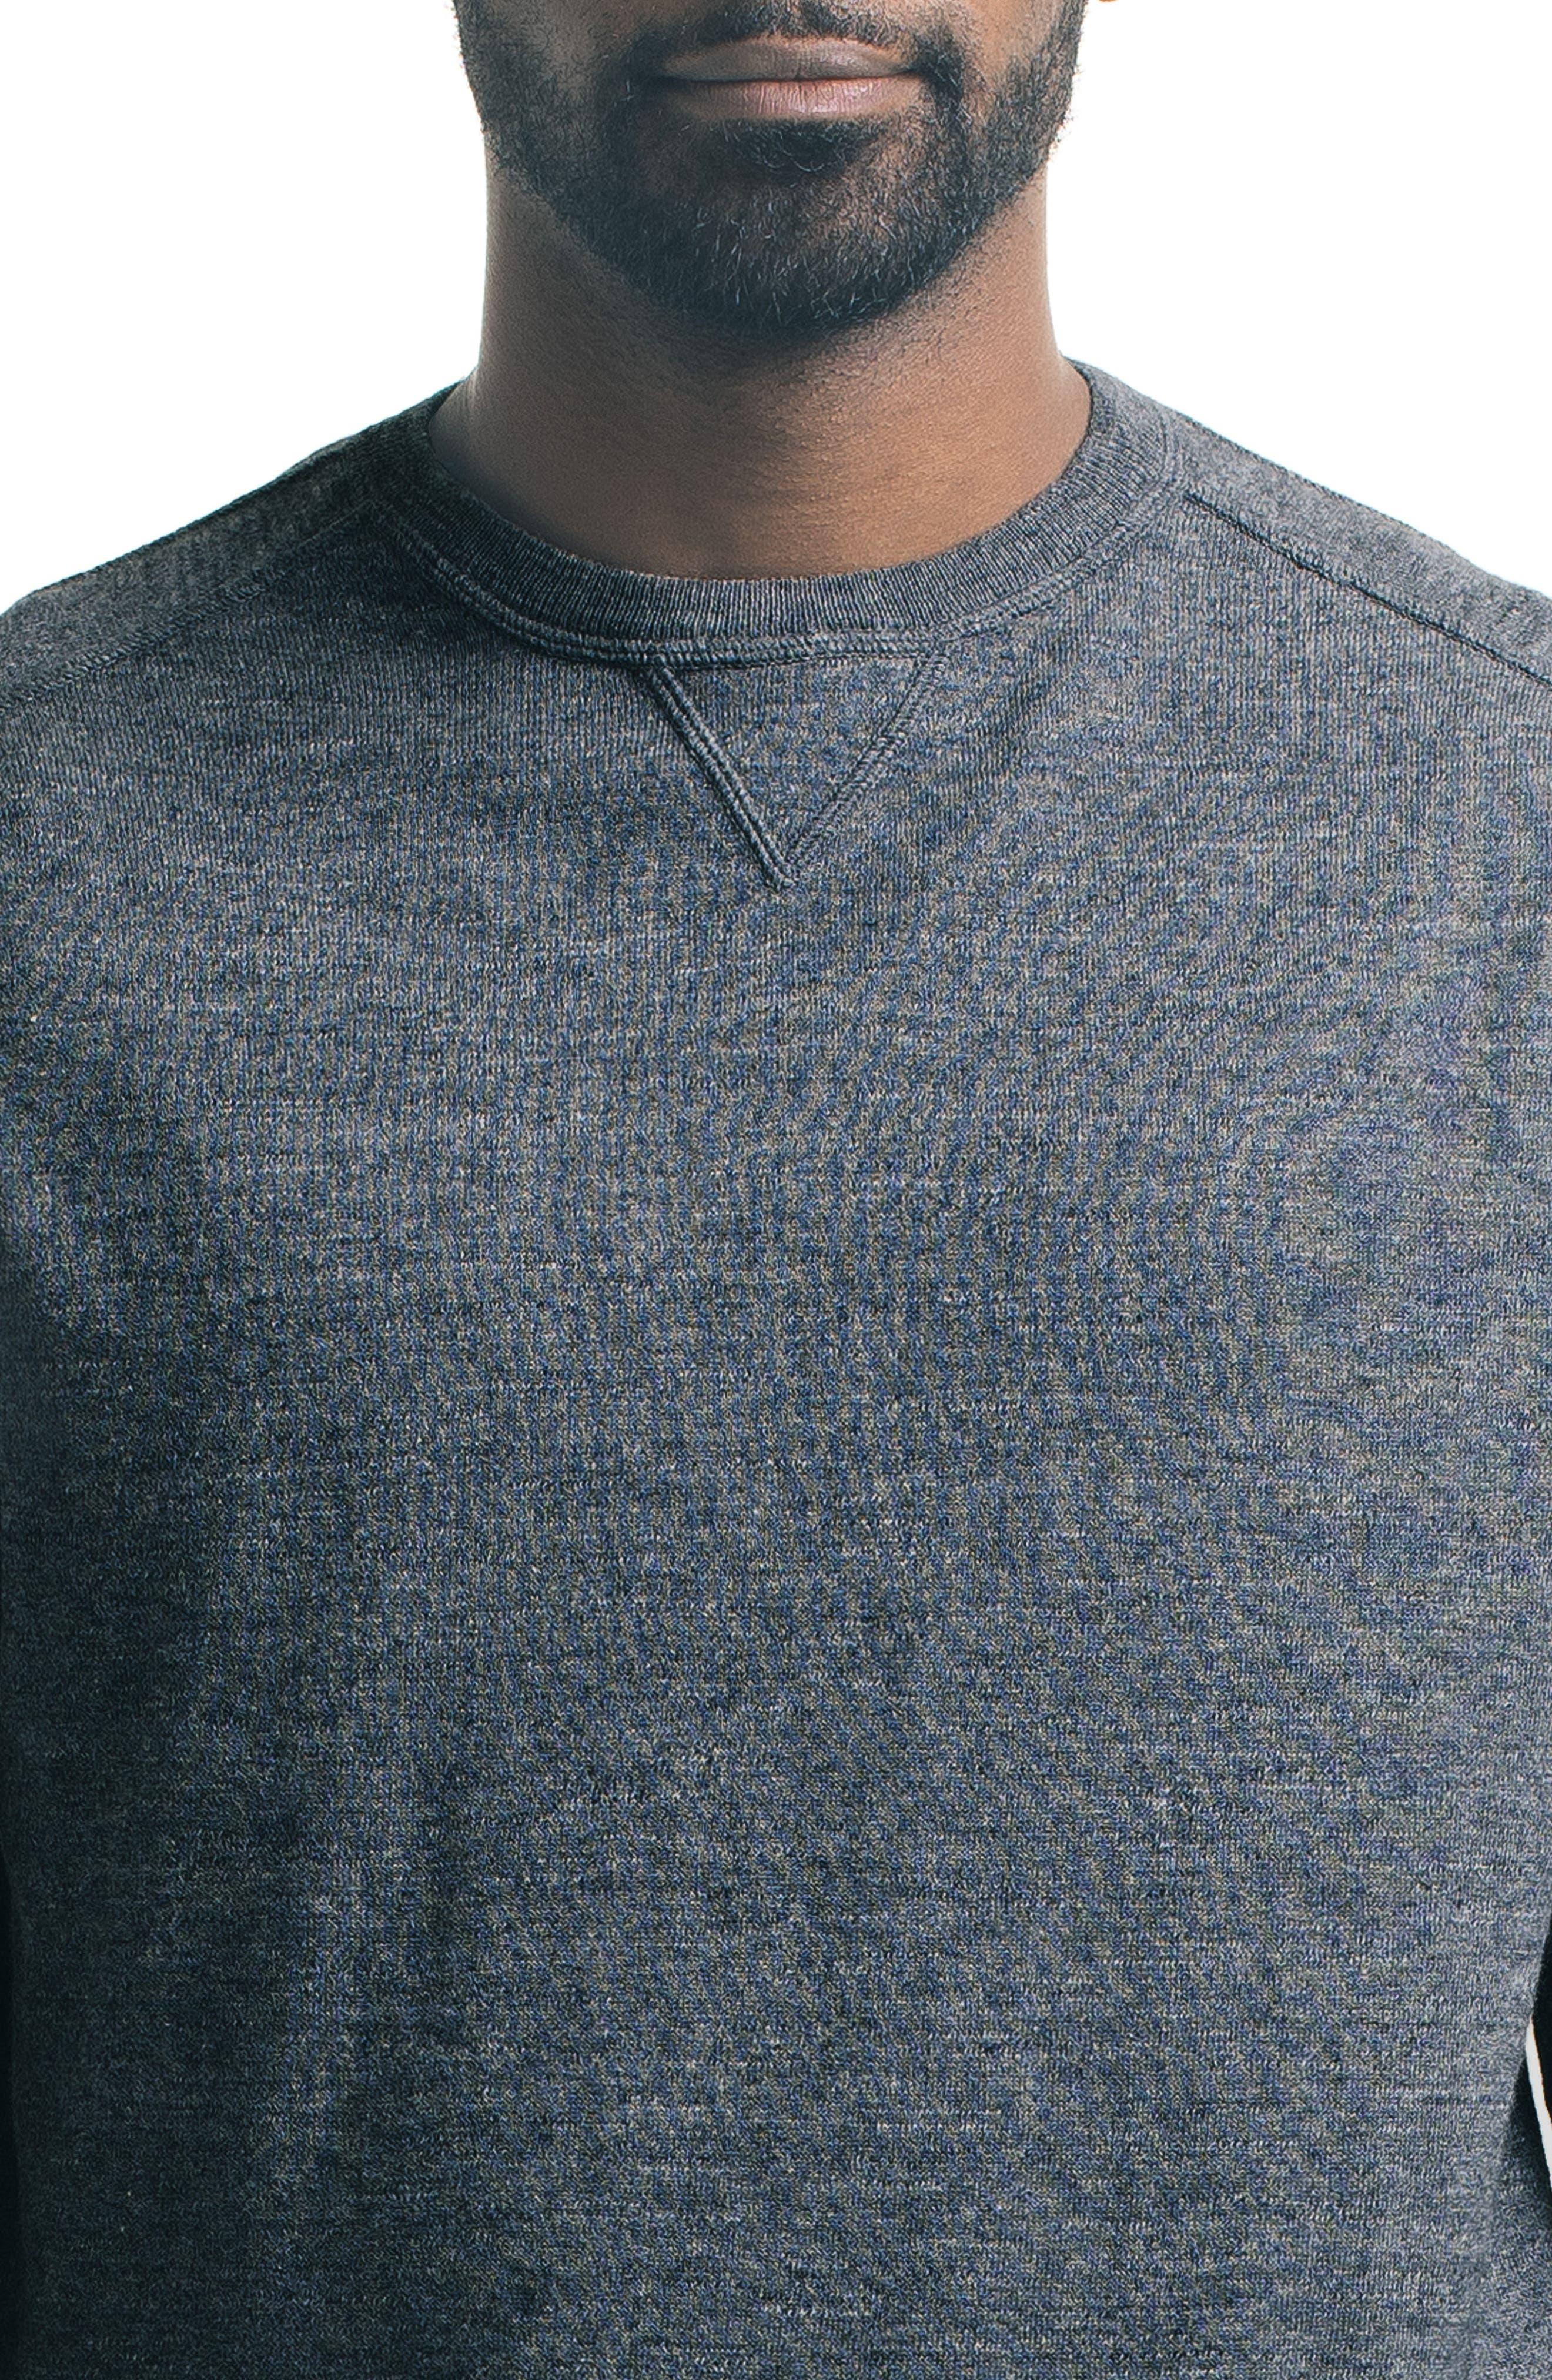 Slub Pullover Sweater,                             Alternate thumbnail 4, color,                             Charcoal